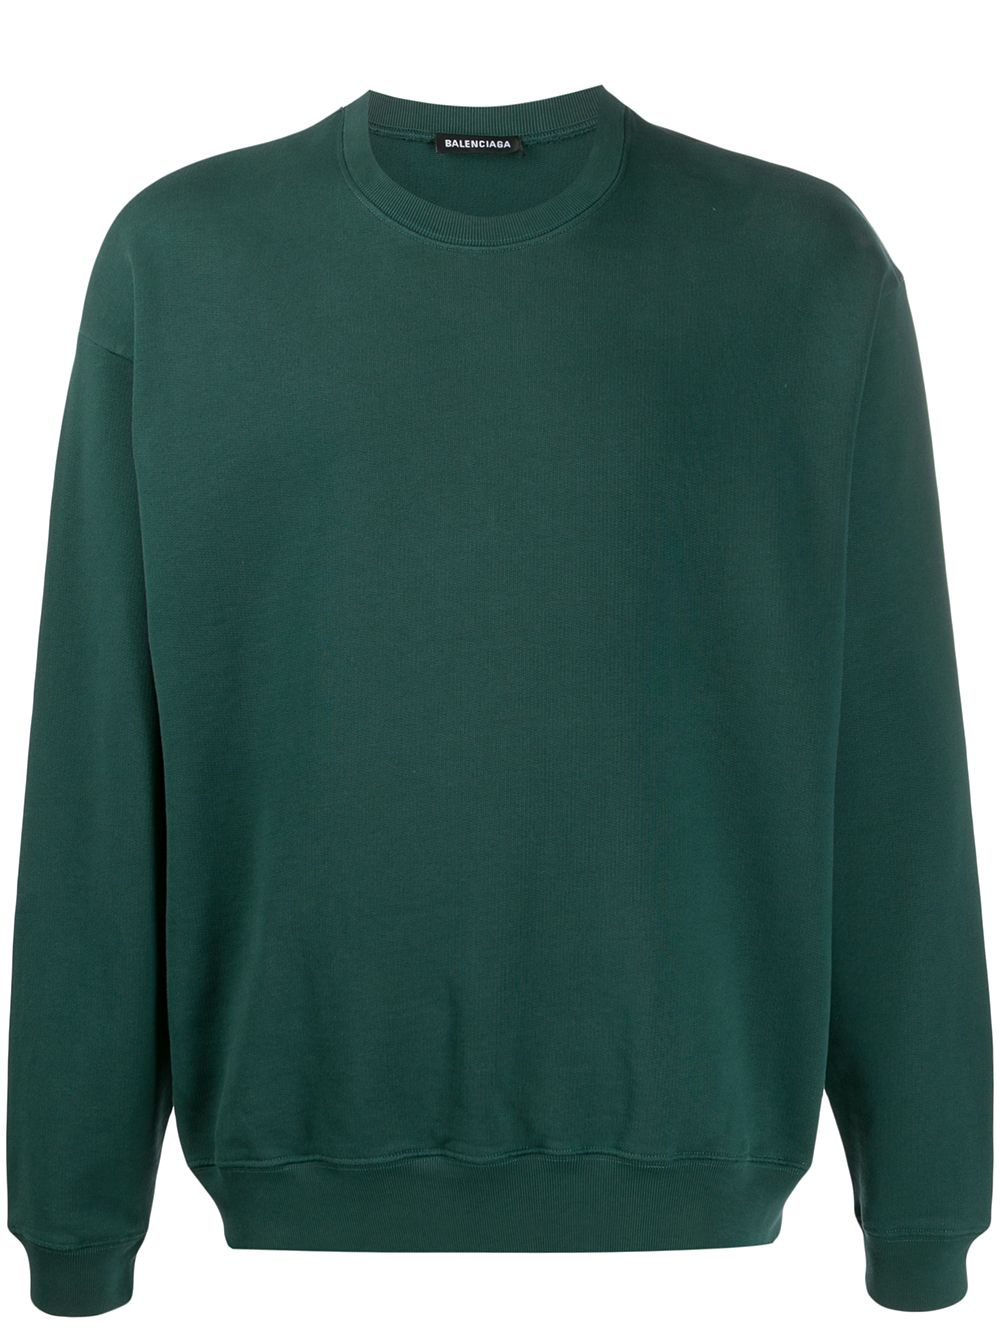 Balenciaga Sweatshirt mit Logo-Print - Grün